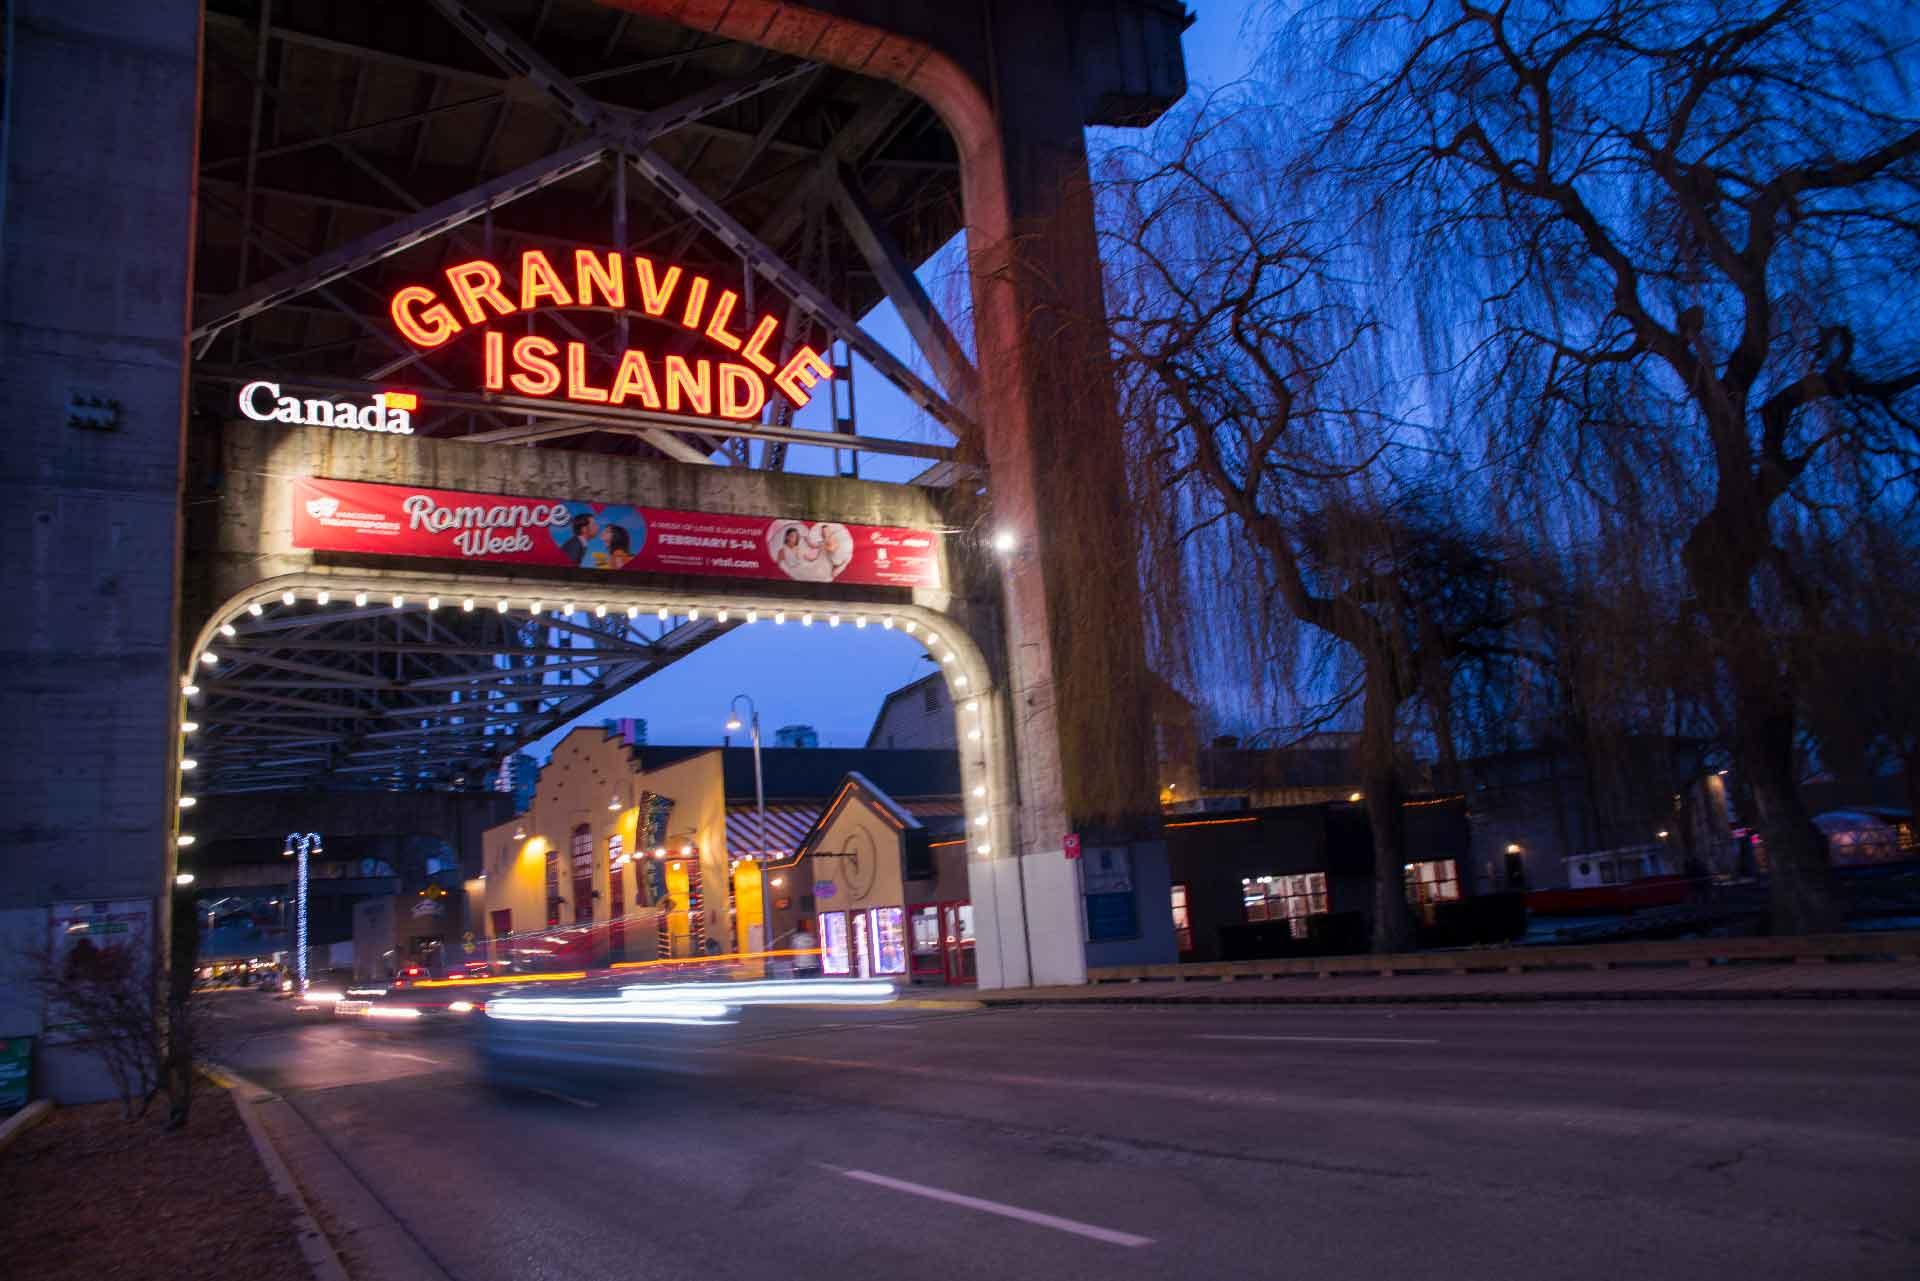 Grandville Vancouver Canada